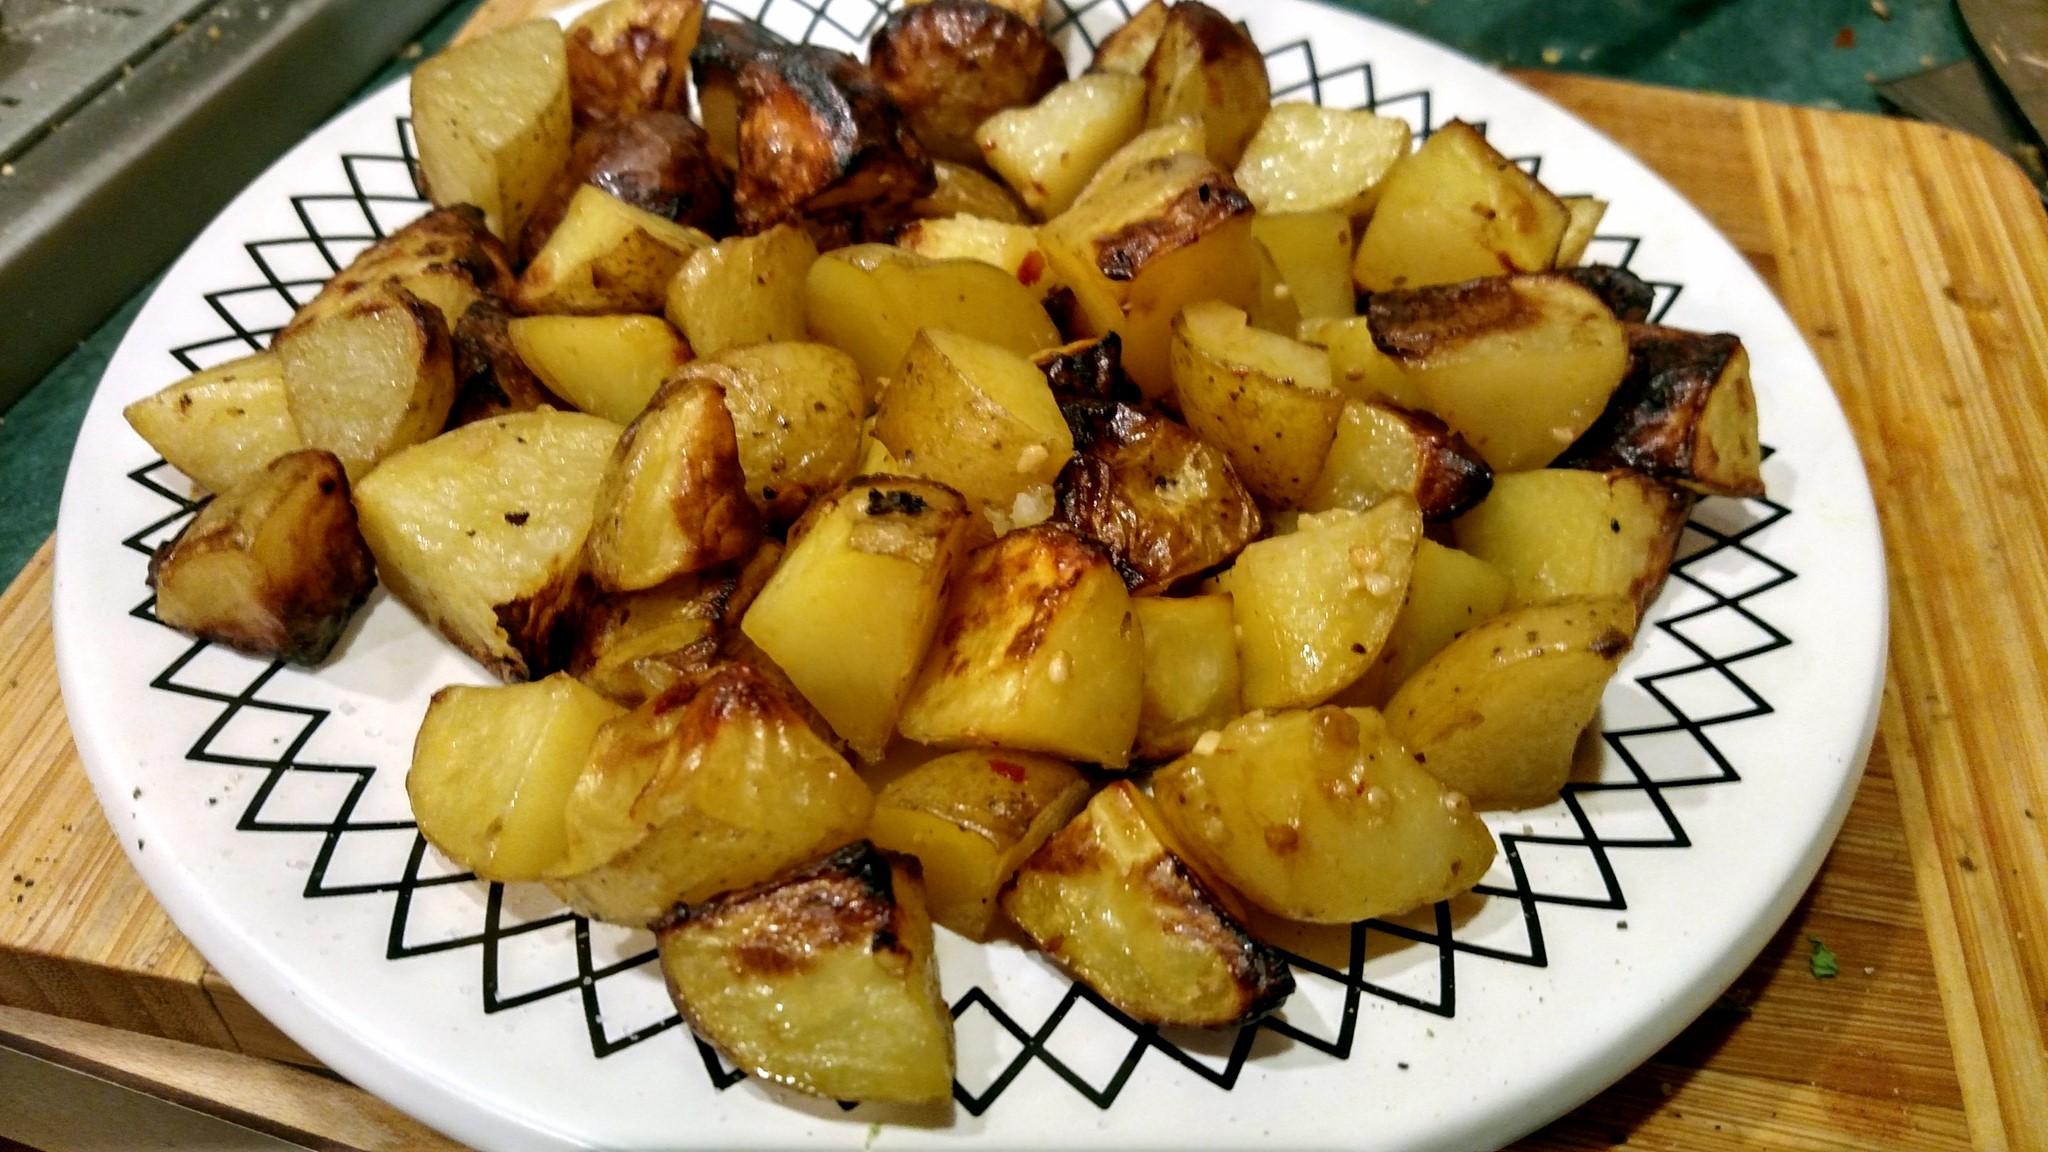 Garlic Roasted Potatoes – Healthy Binge Snack